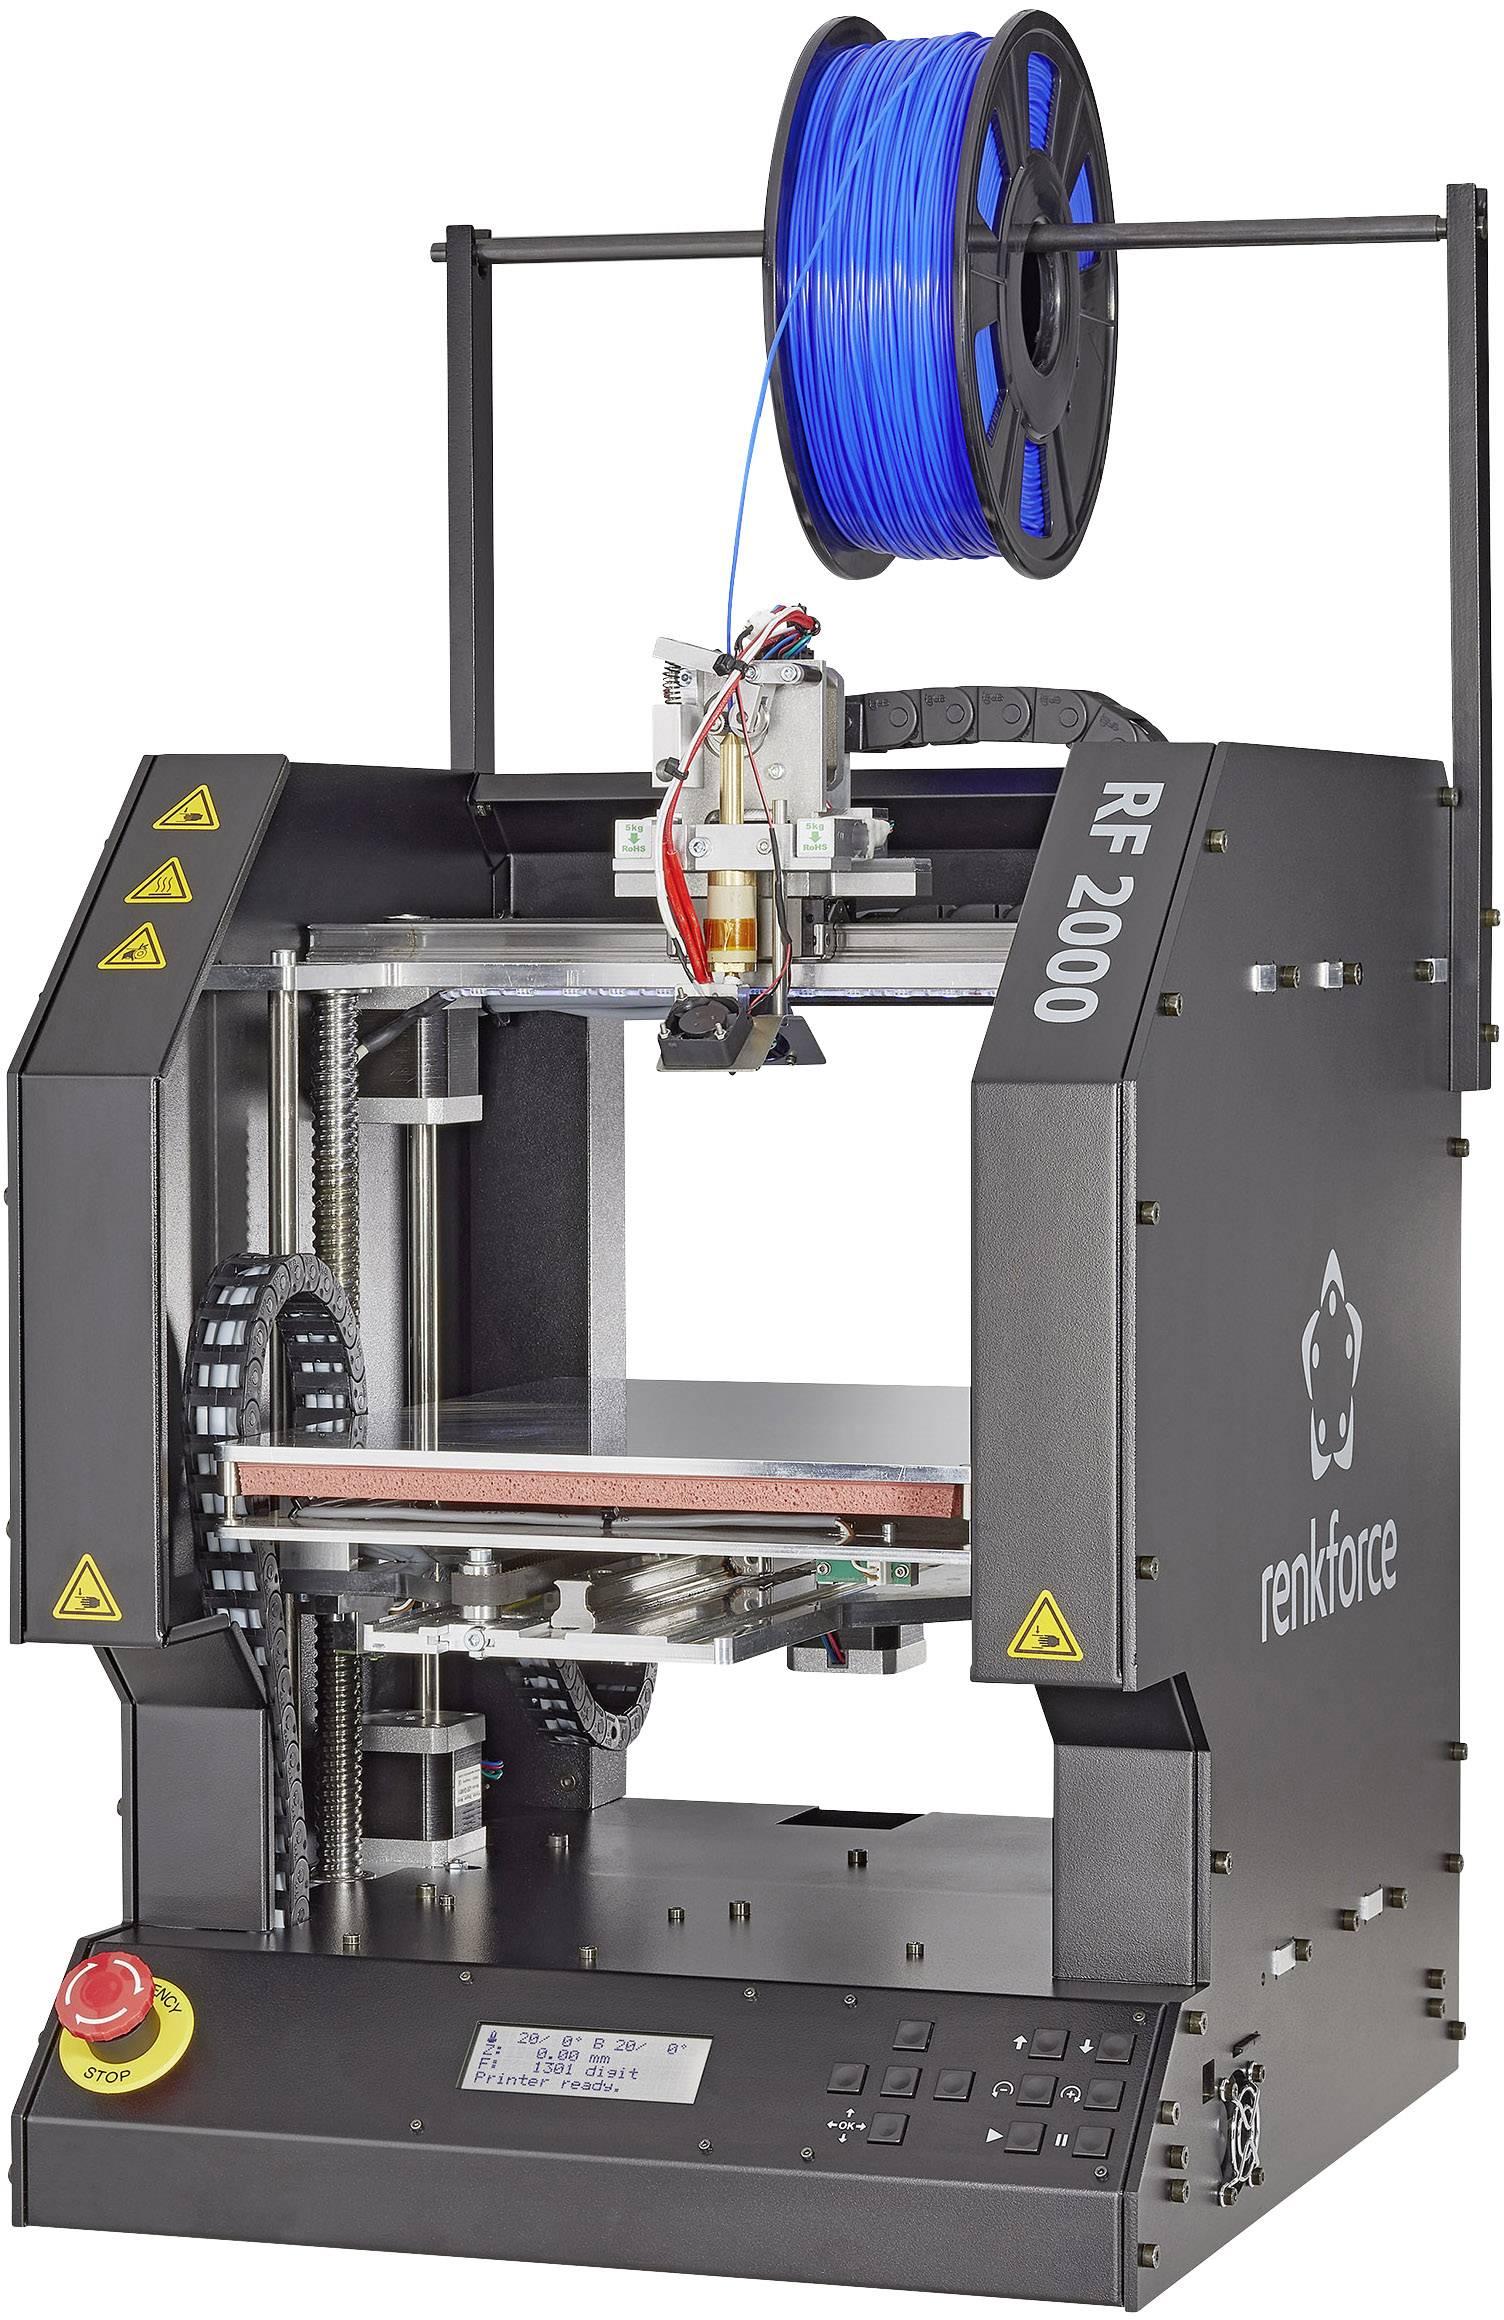 Stavebnice 3D tiskárny Renkforce RF2000v2 BSS, zdokonalená verze, 1 extrudér